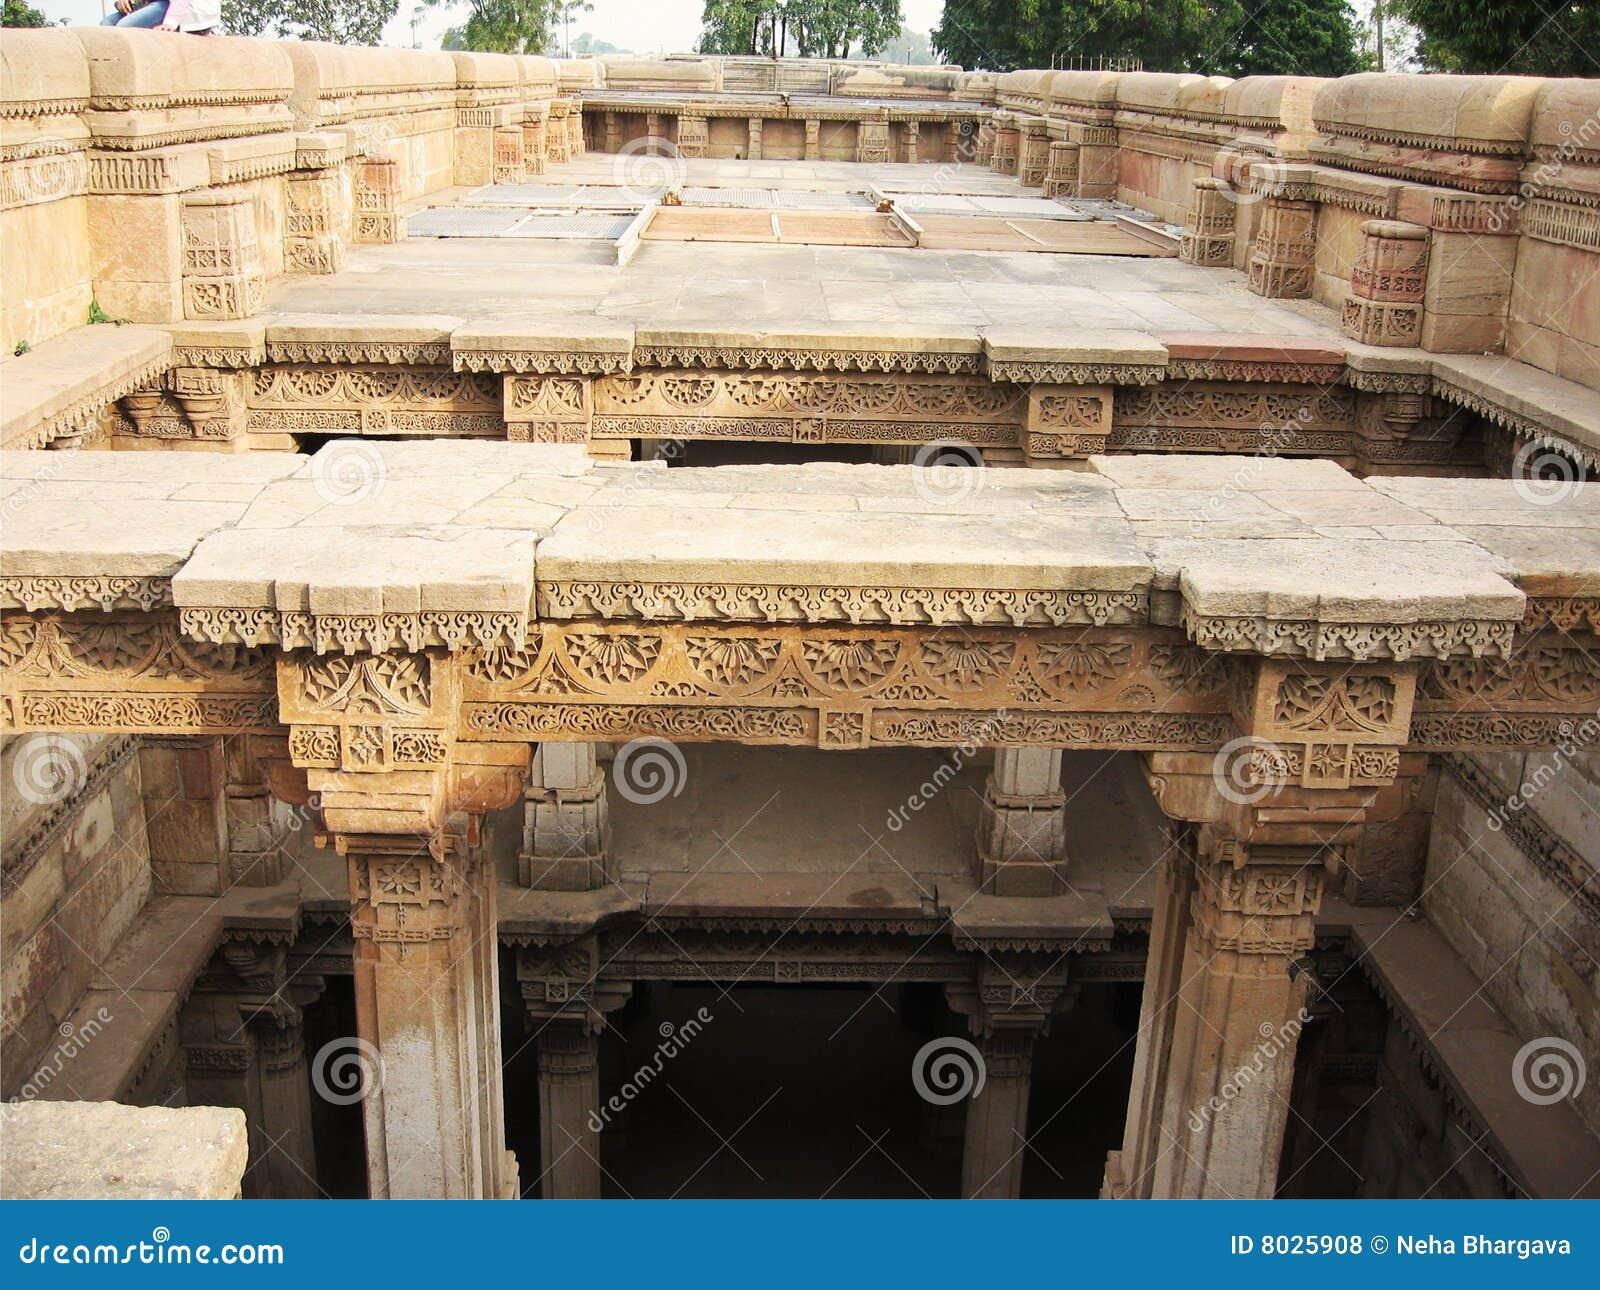 Ancient Stone Pillars : Carved stone pillars royalty free stock photos image